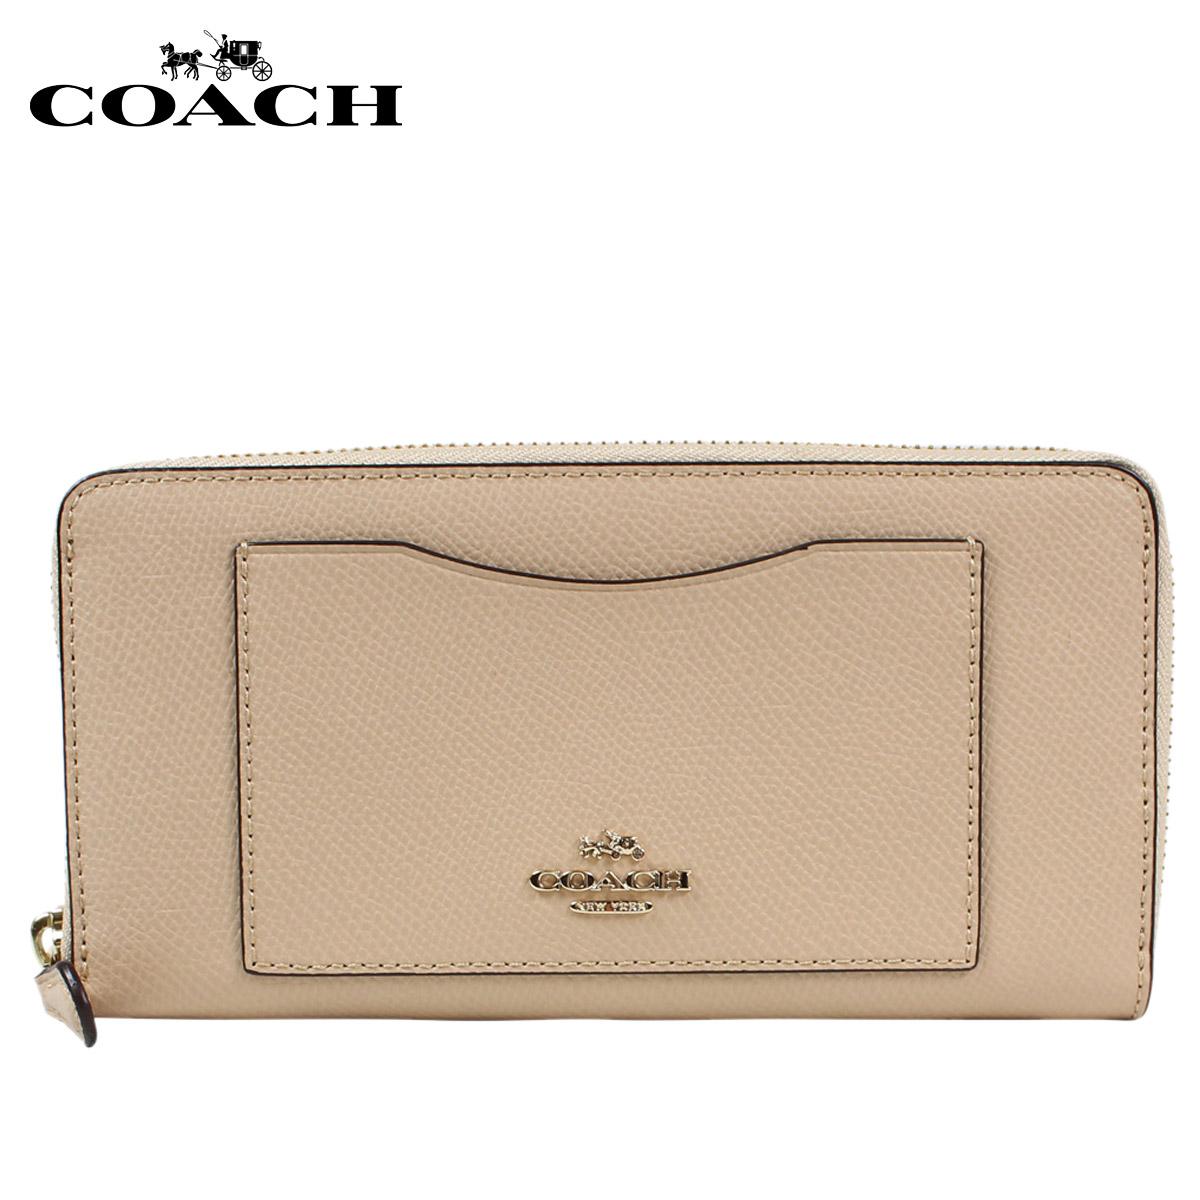 ... coupon code for coach coach wallets purse f54007 beige womens 5d6a2  d6d06 7ec75ca6bb4b7